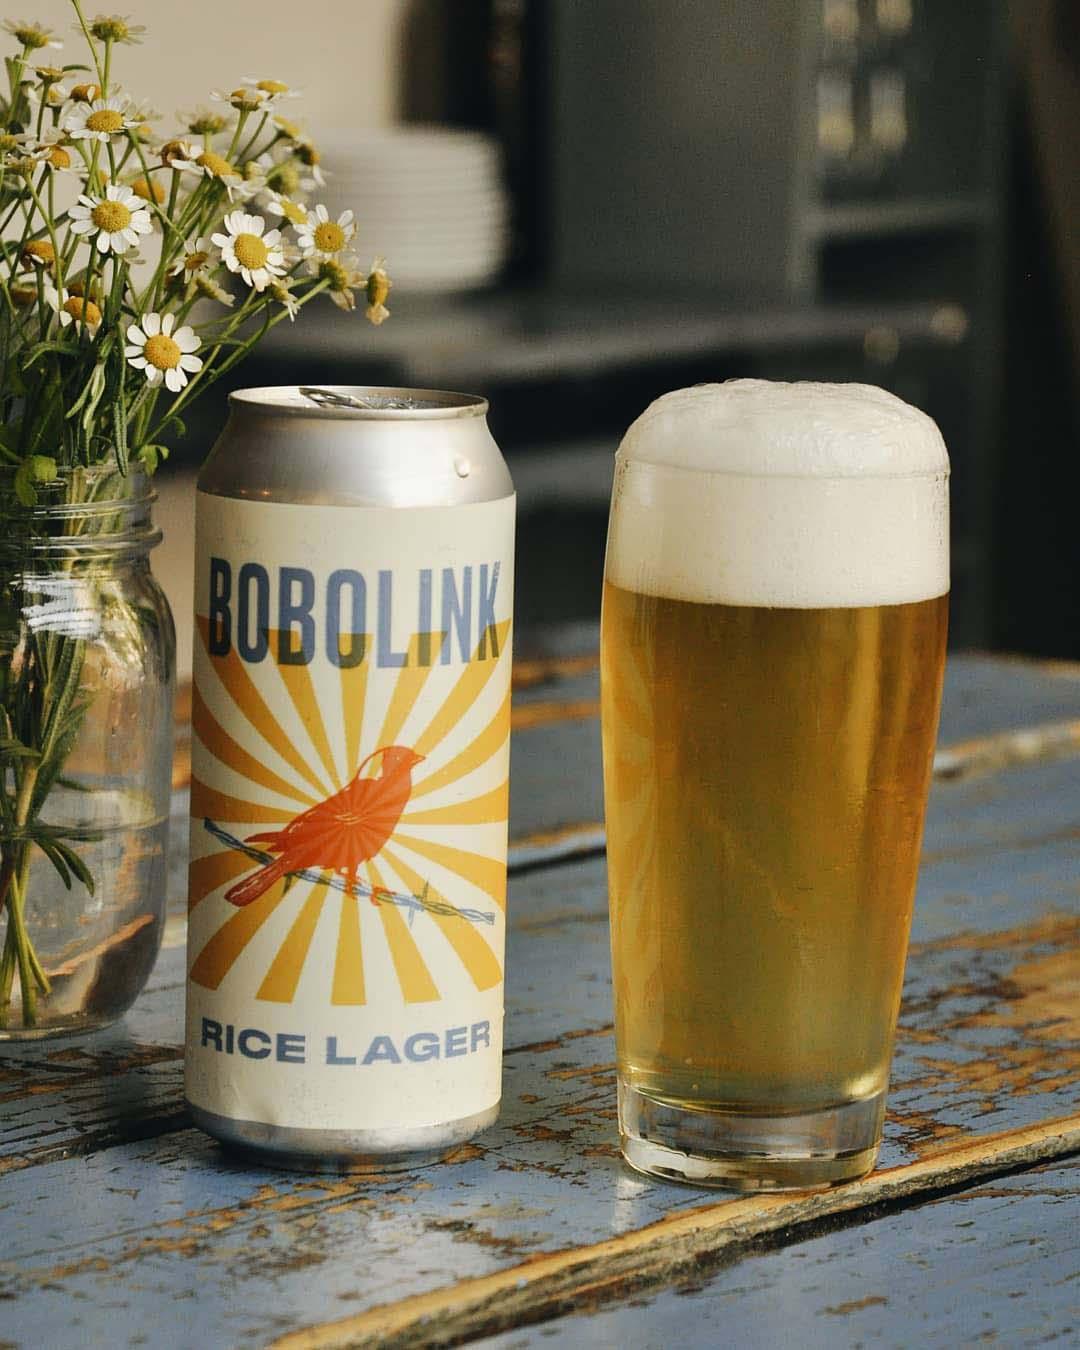 Bellwoods Brewery, Bobolink